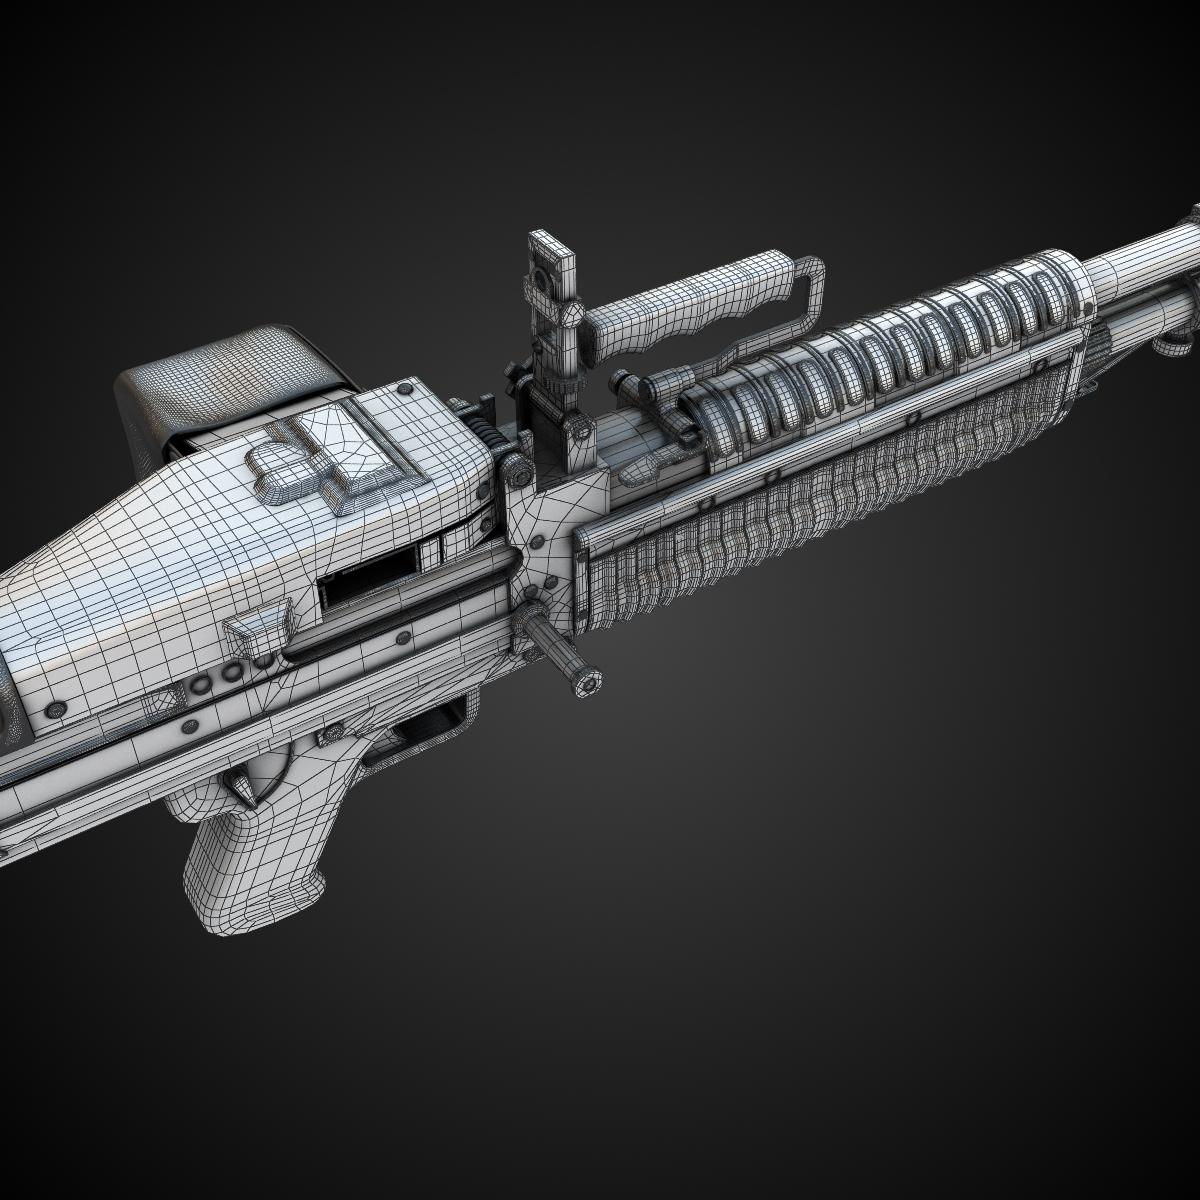 m60 machine gun - photo #48